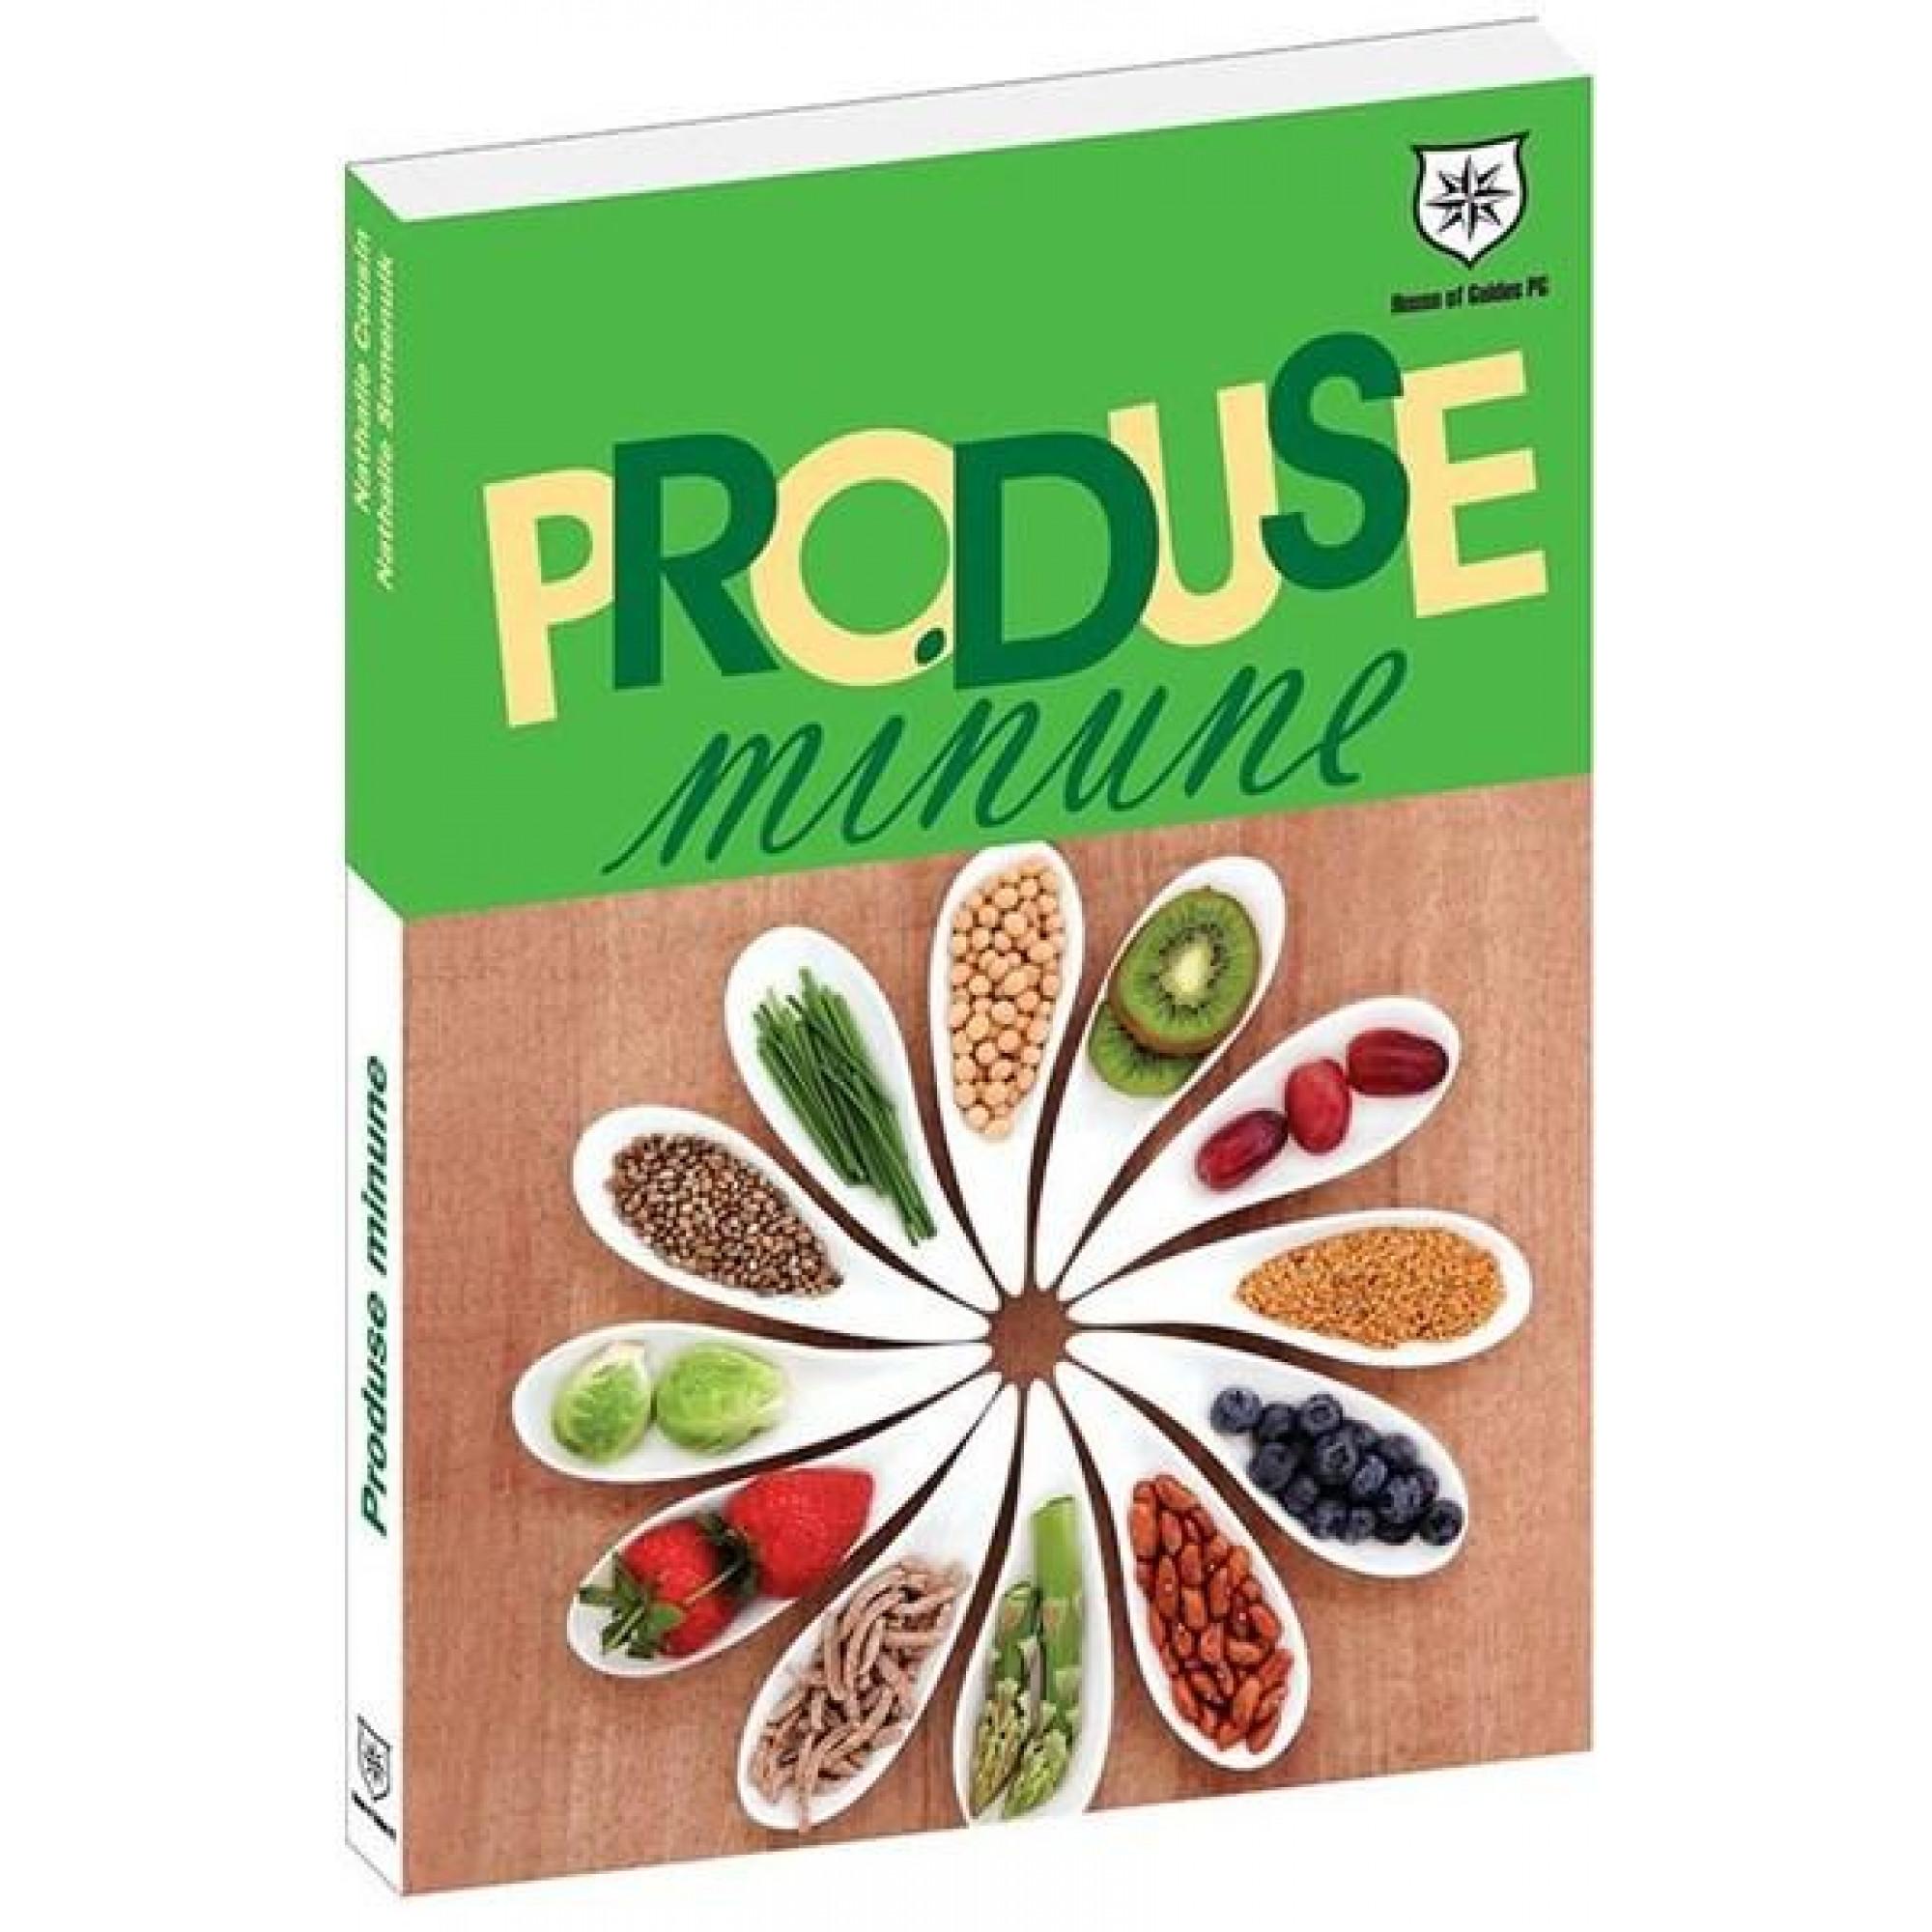 Produse minune - Fructe și legume; Nathalie Cousin